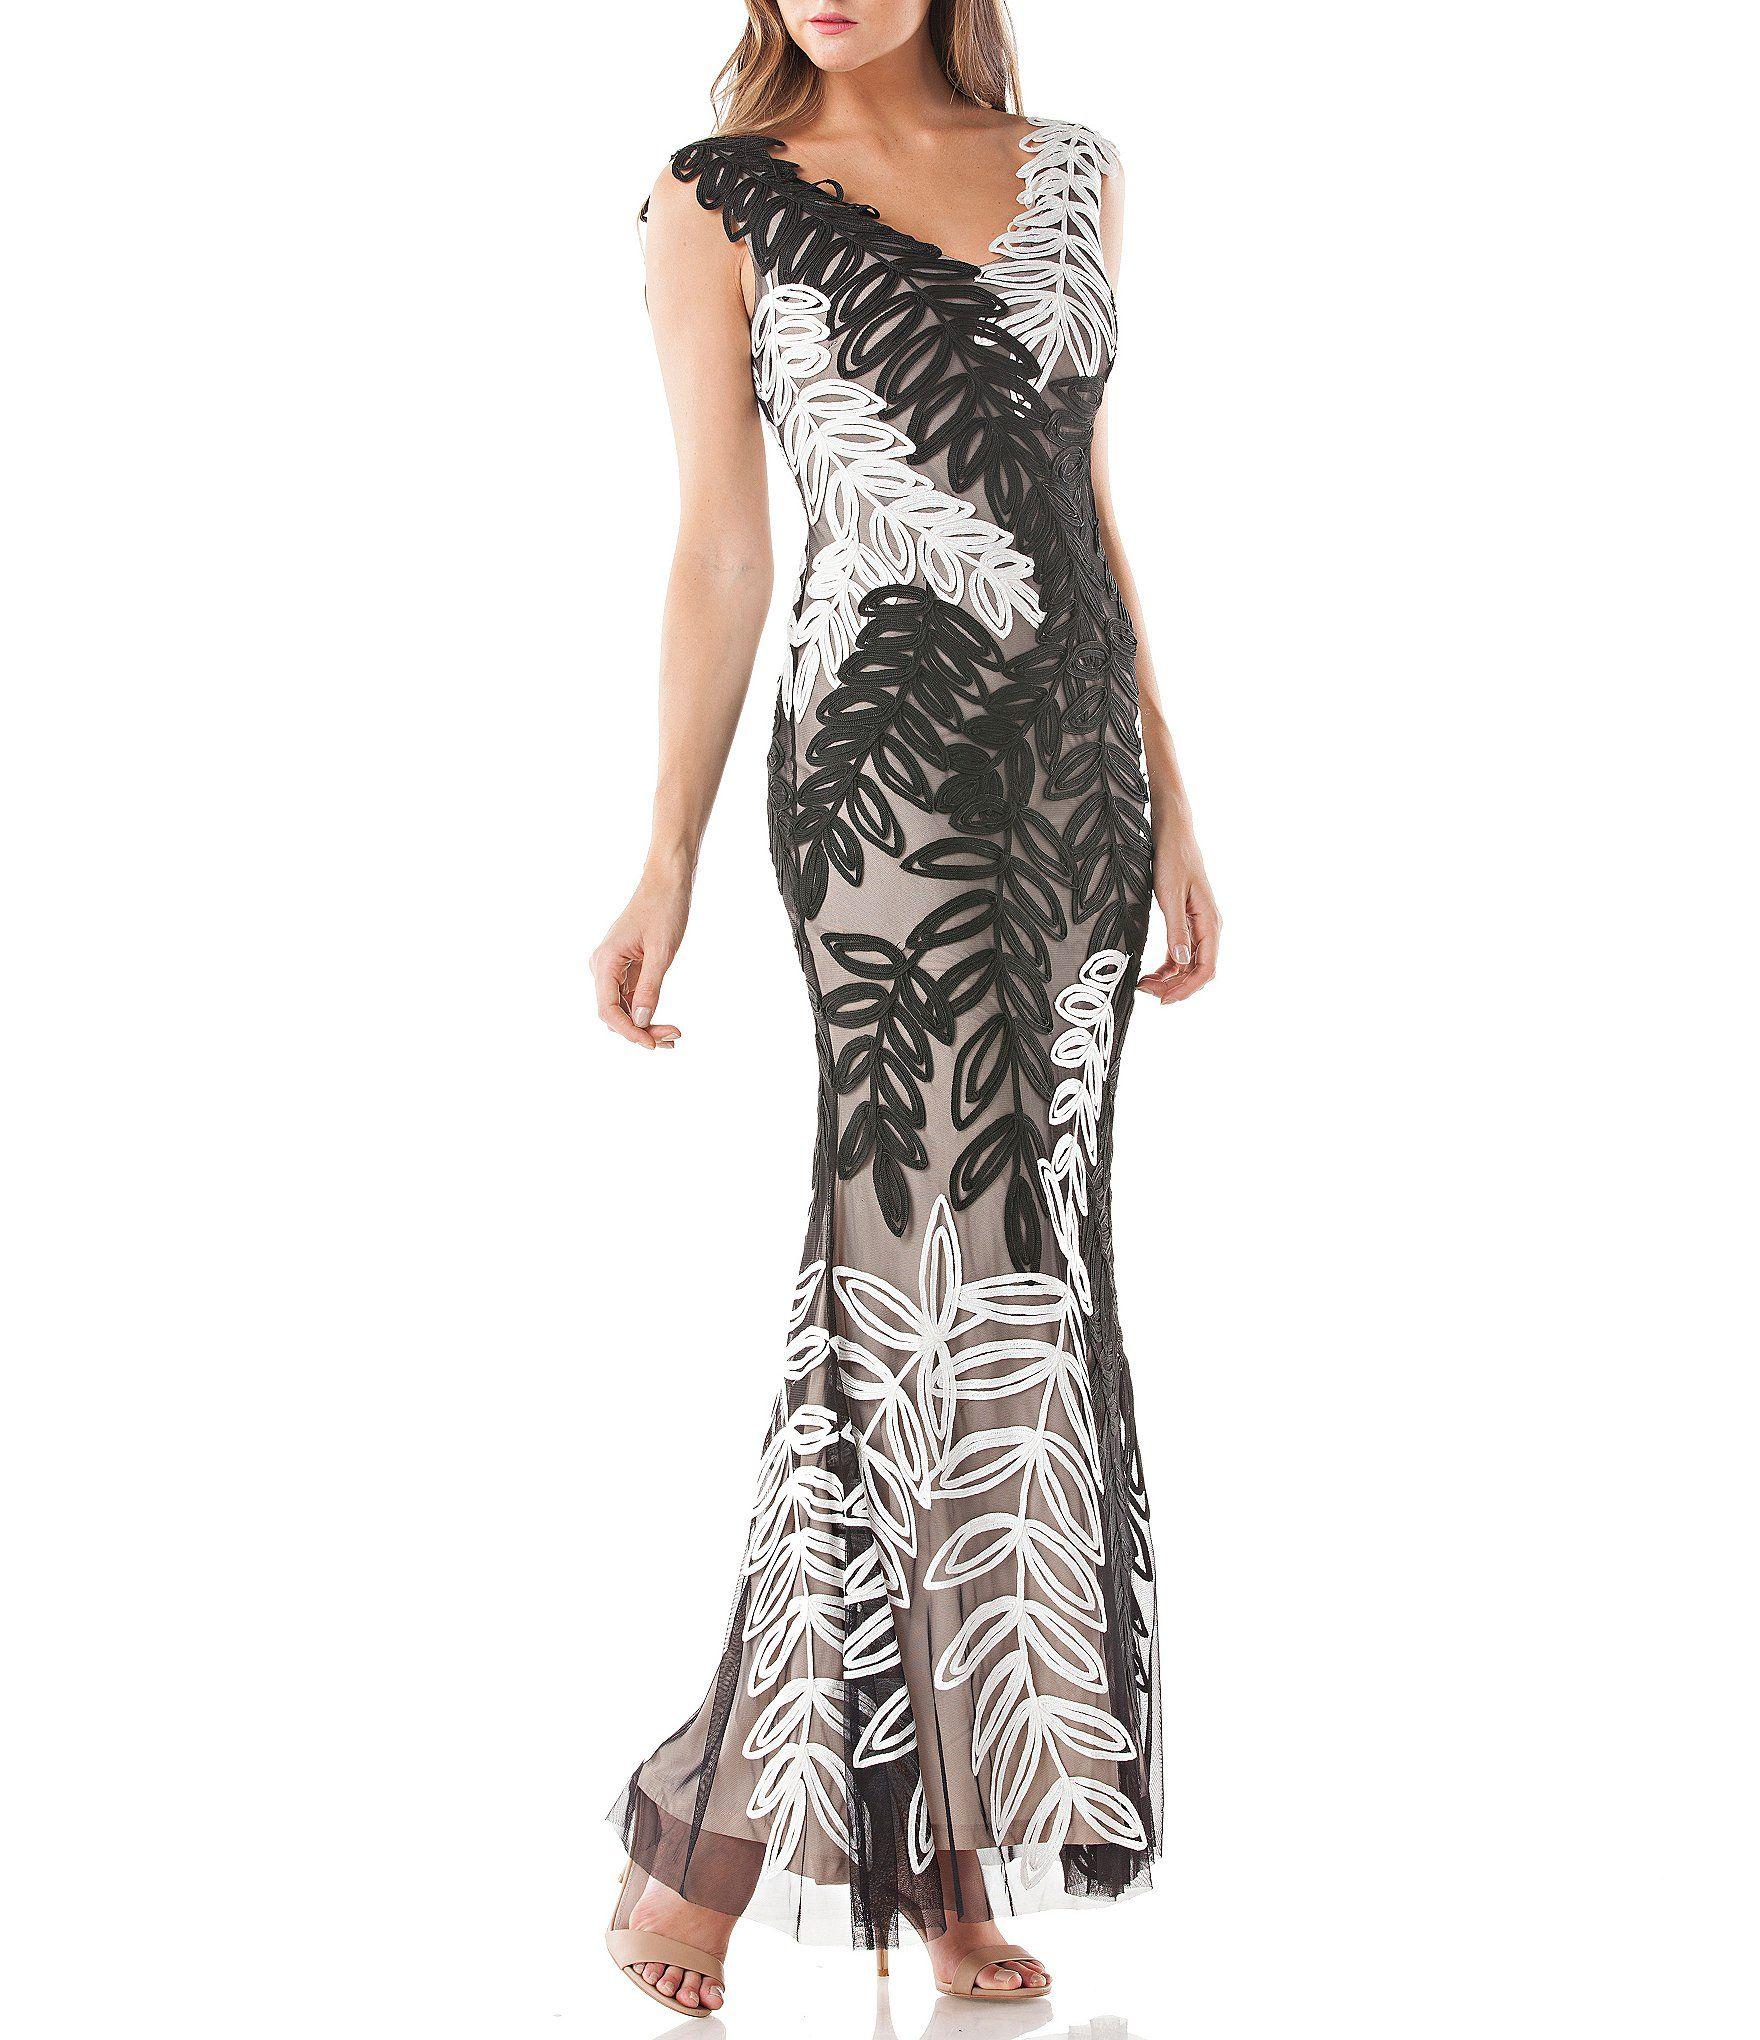 Js collections vneck soutache gown in mob dress pinterest